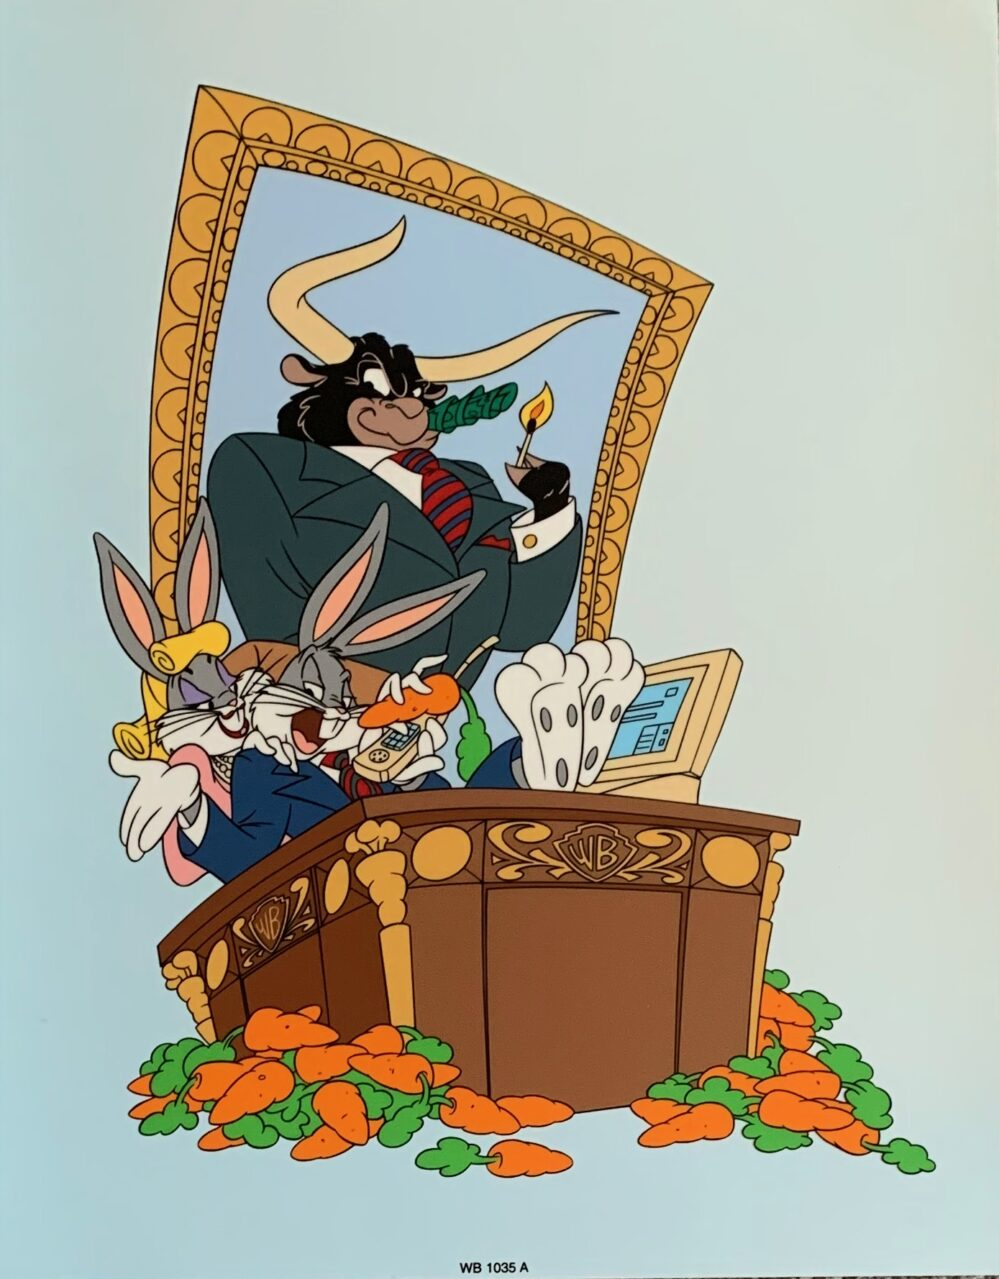 Warner Bros BUGS BUNNY MORE BULL STOCK MARKET Sericel Animation Art Cel